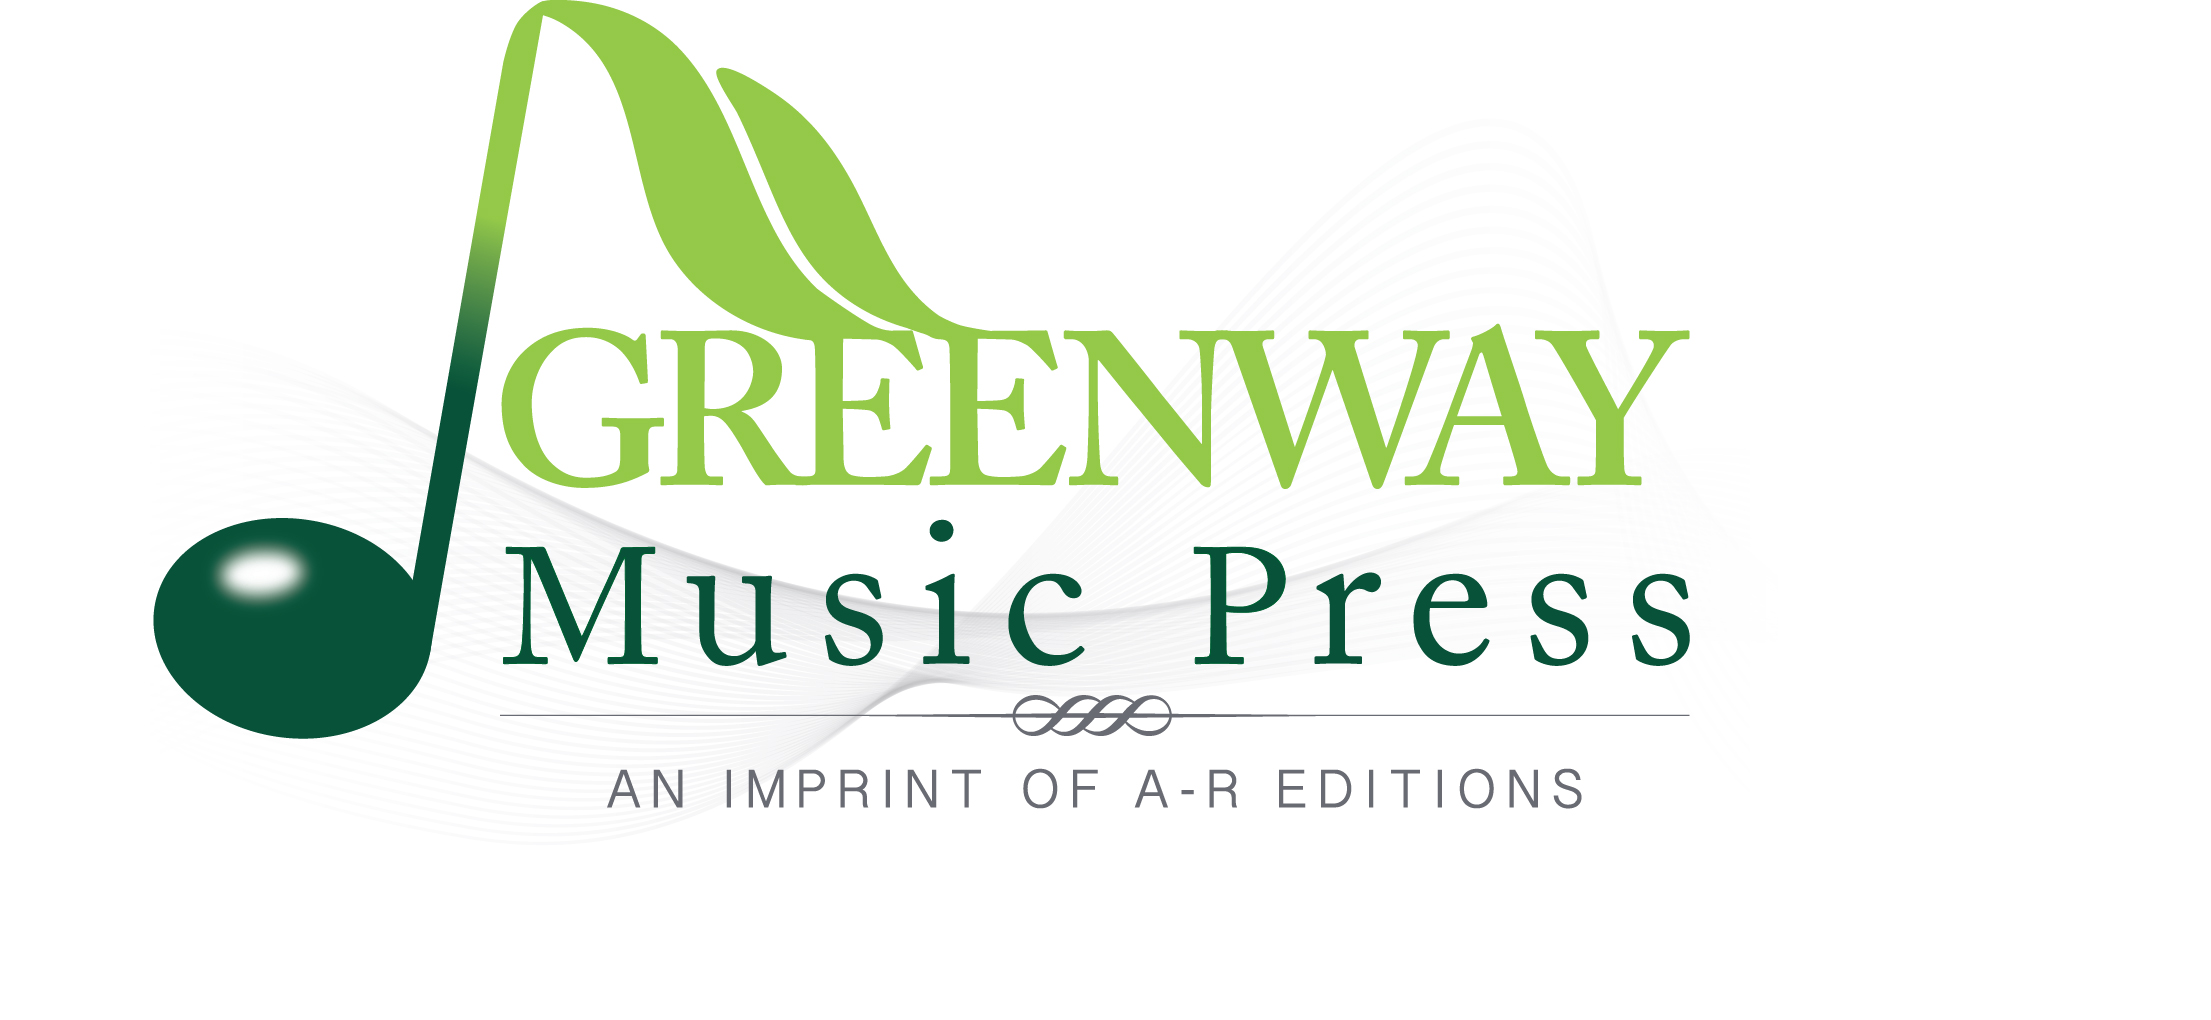 Greenway Music Press